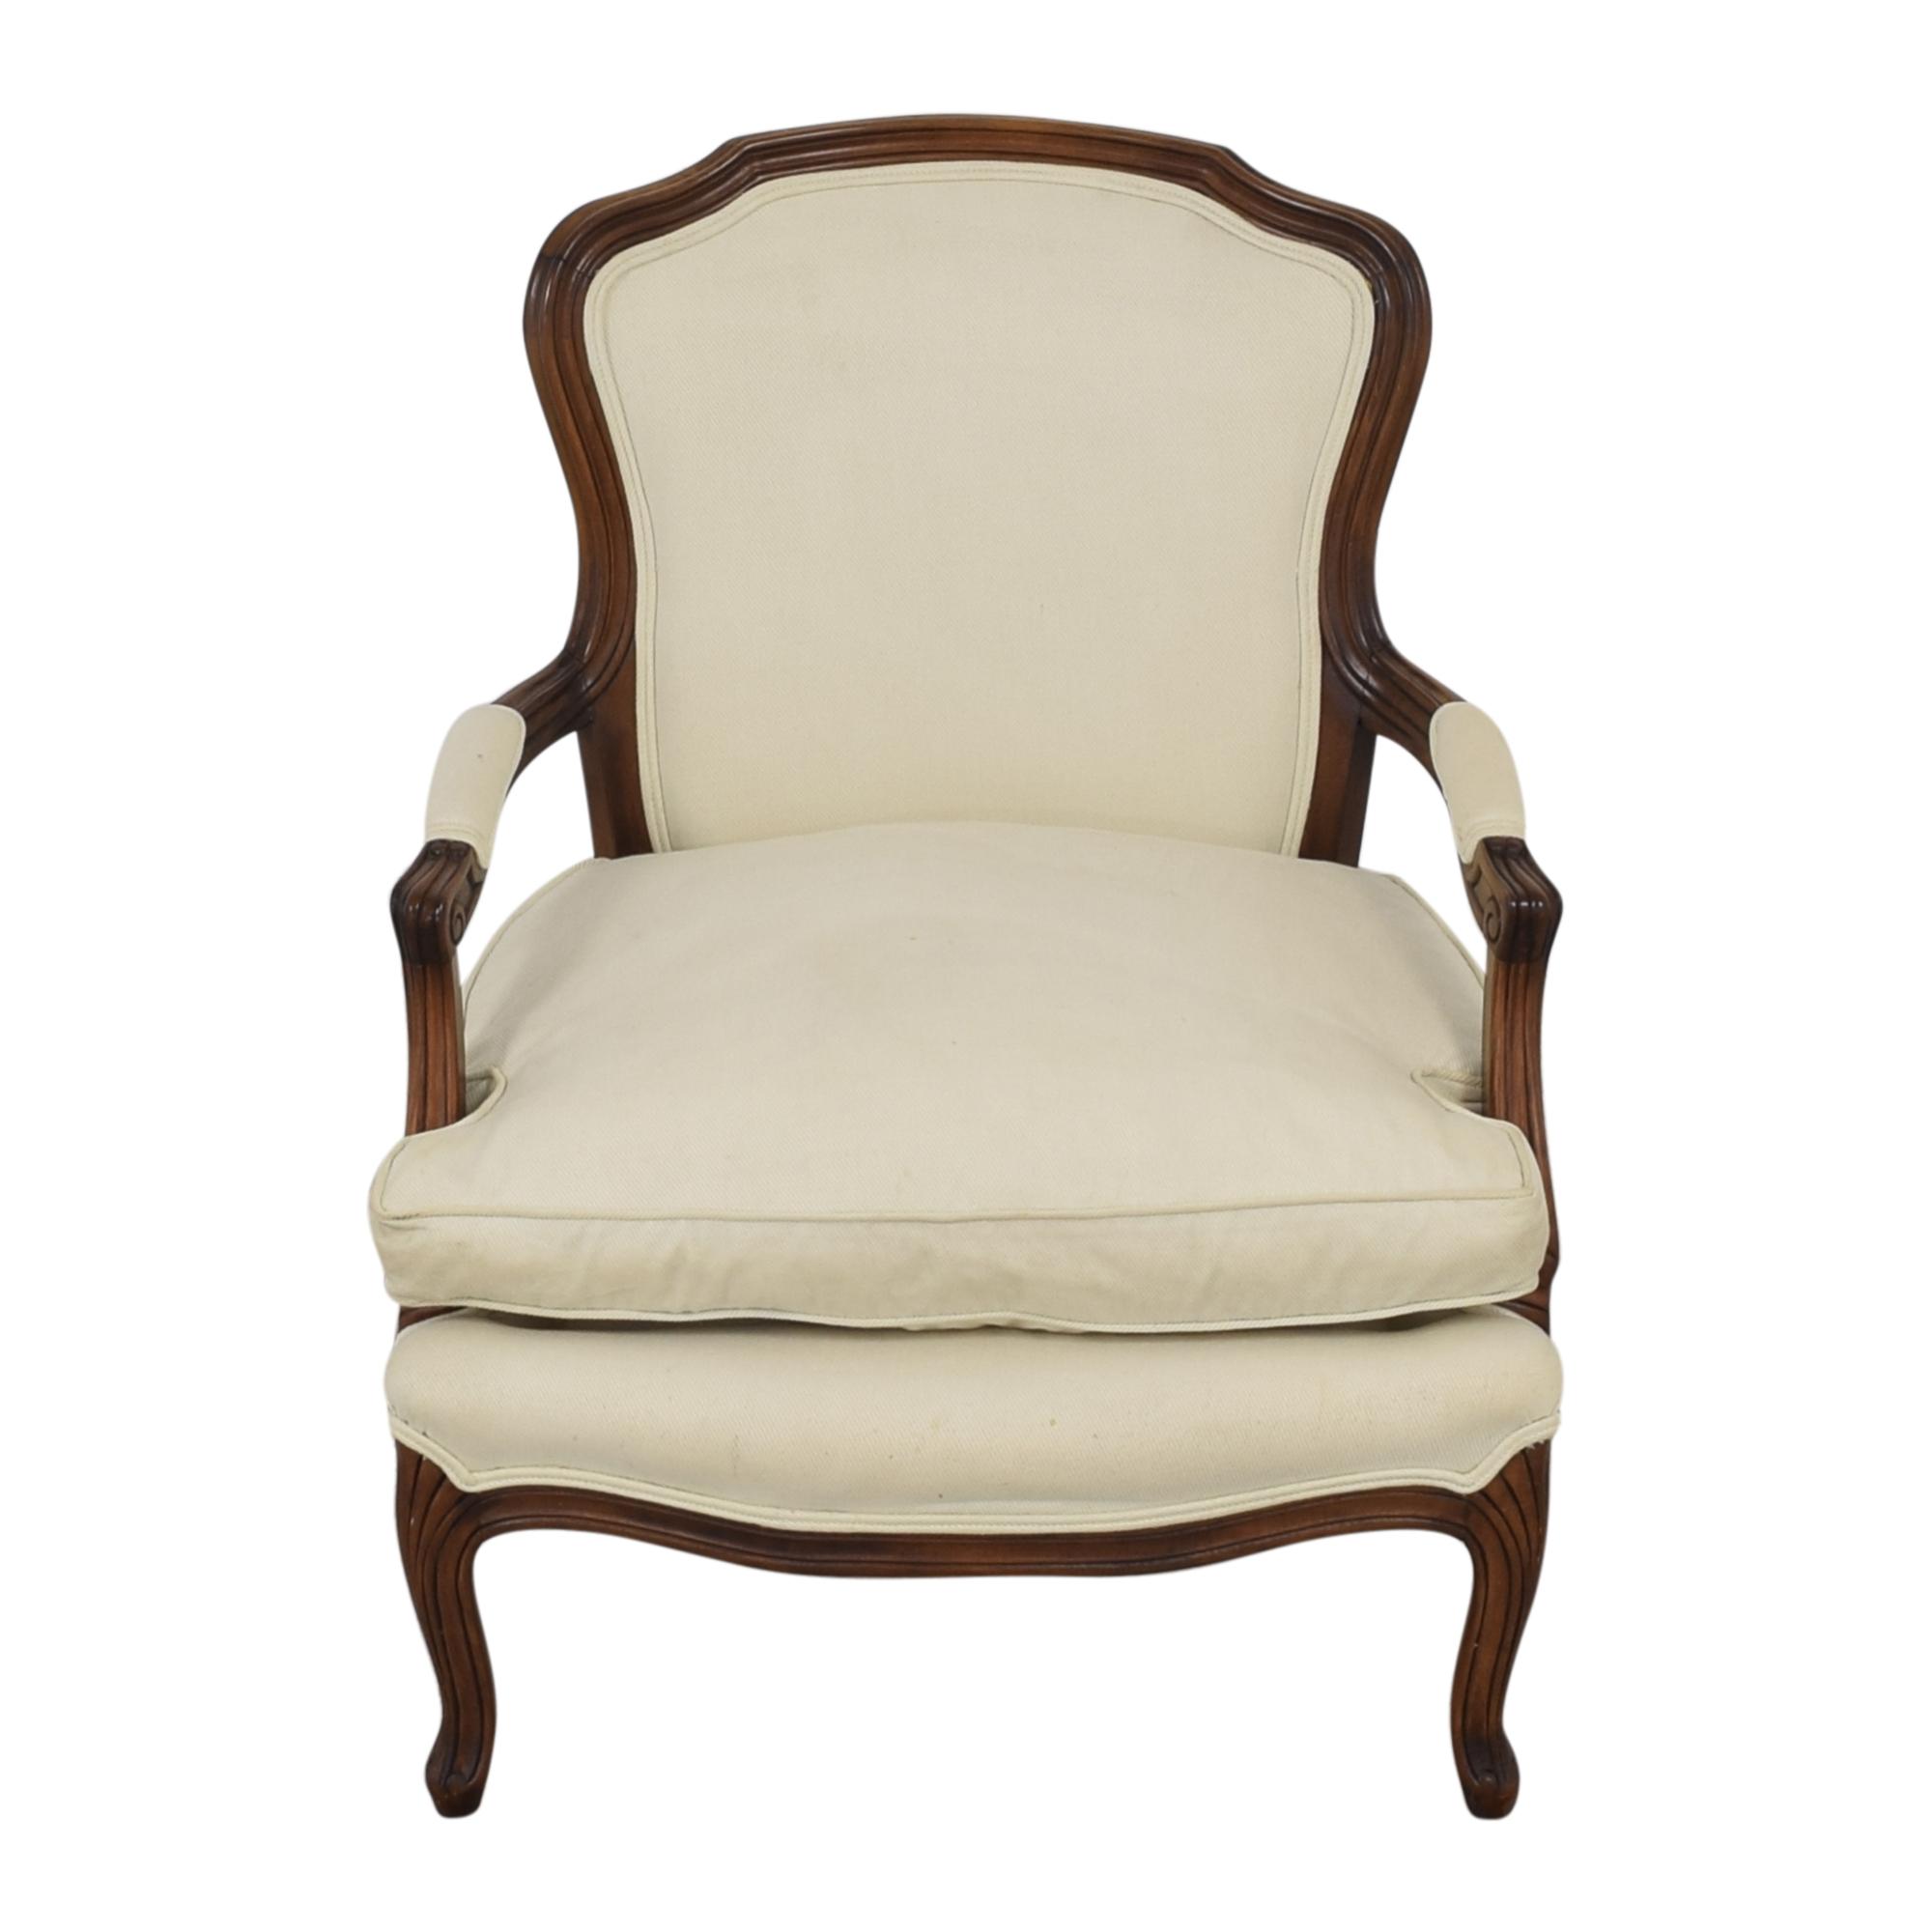 Meyer Gunther Martini Meyer Gunther Martini Louis XV Chair